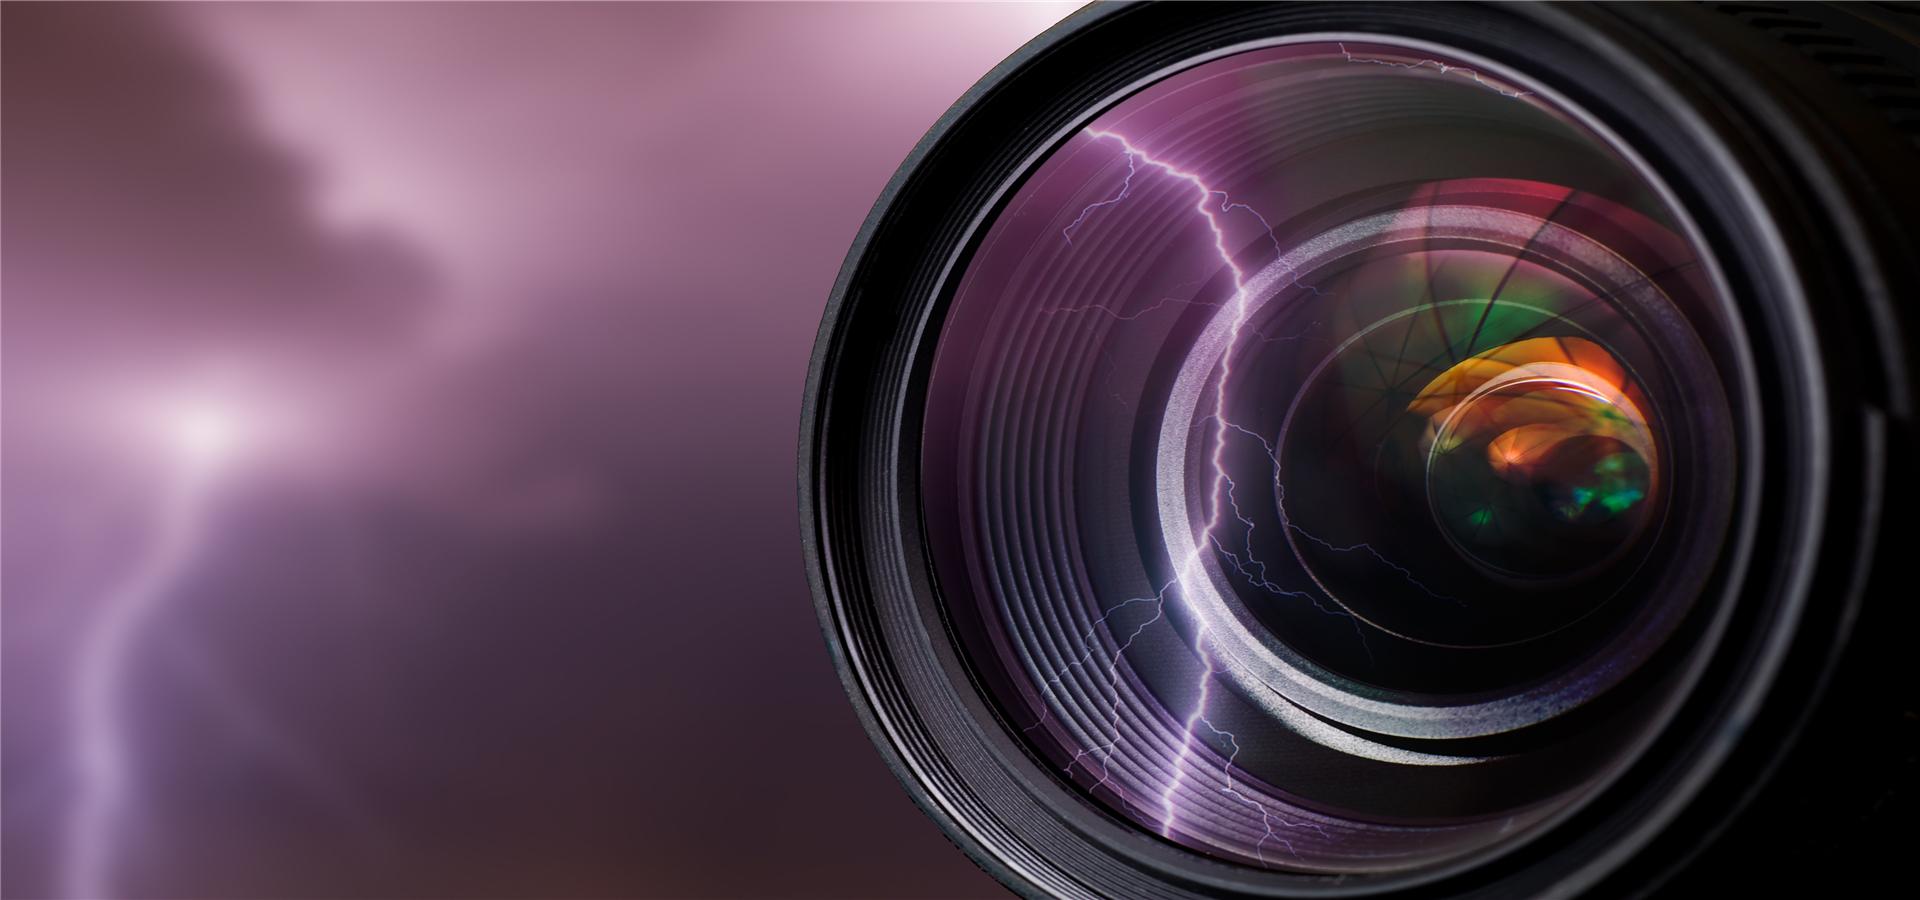 camera photography background  slr camera  digital camera  photograph background image for free